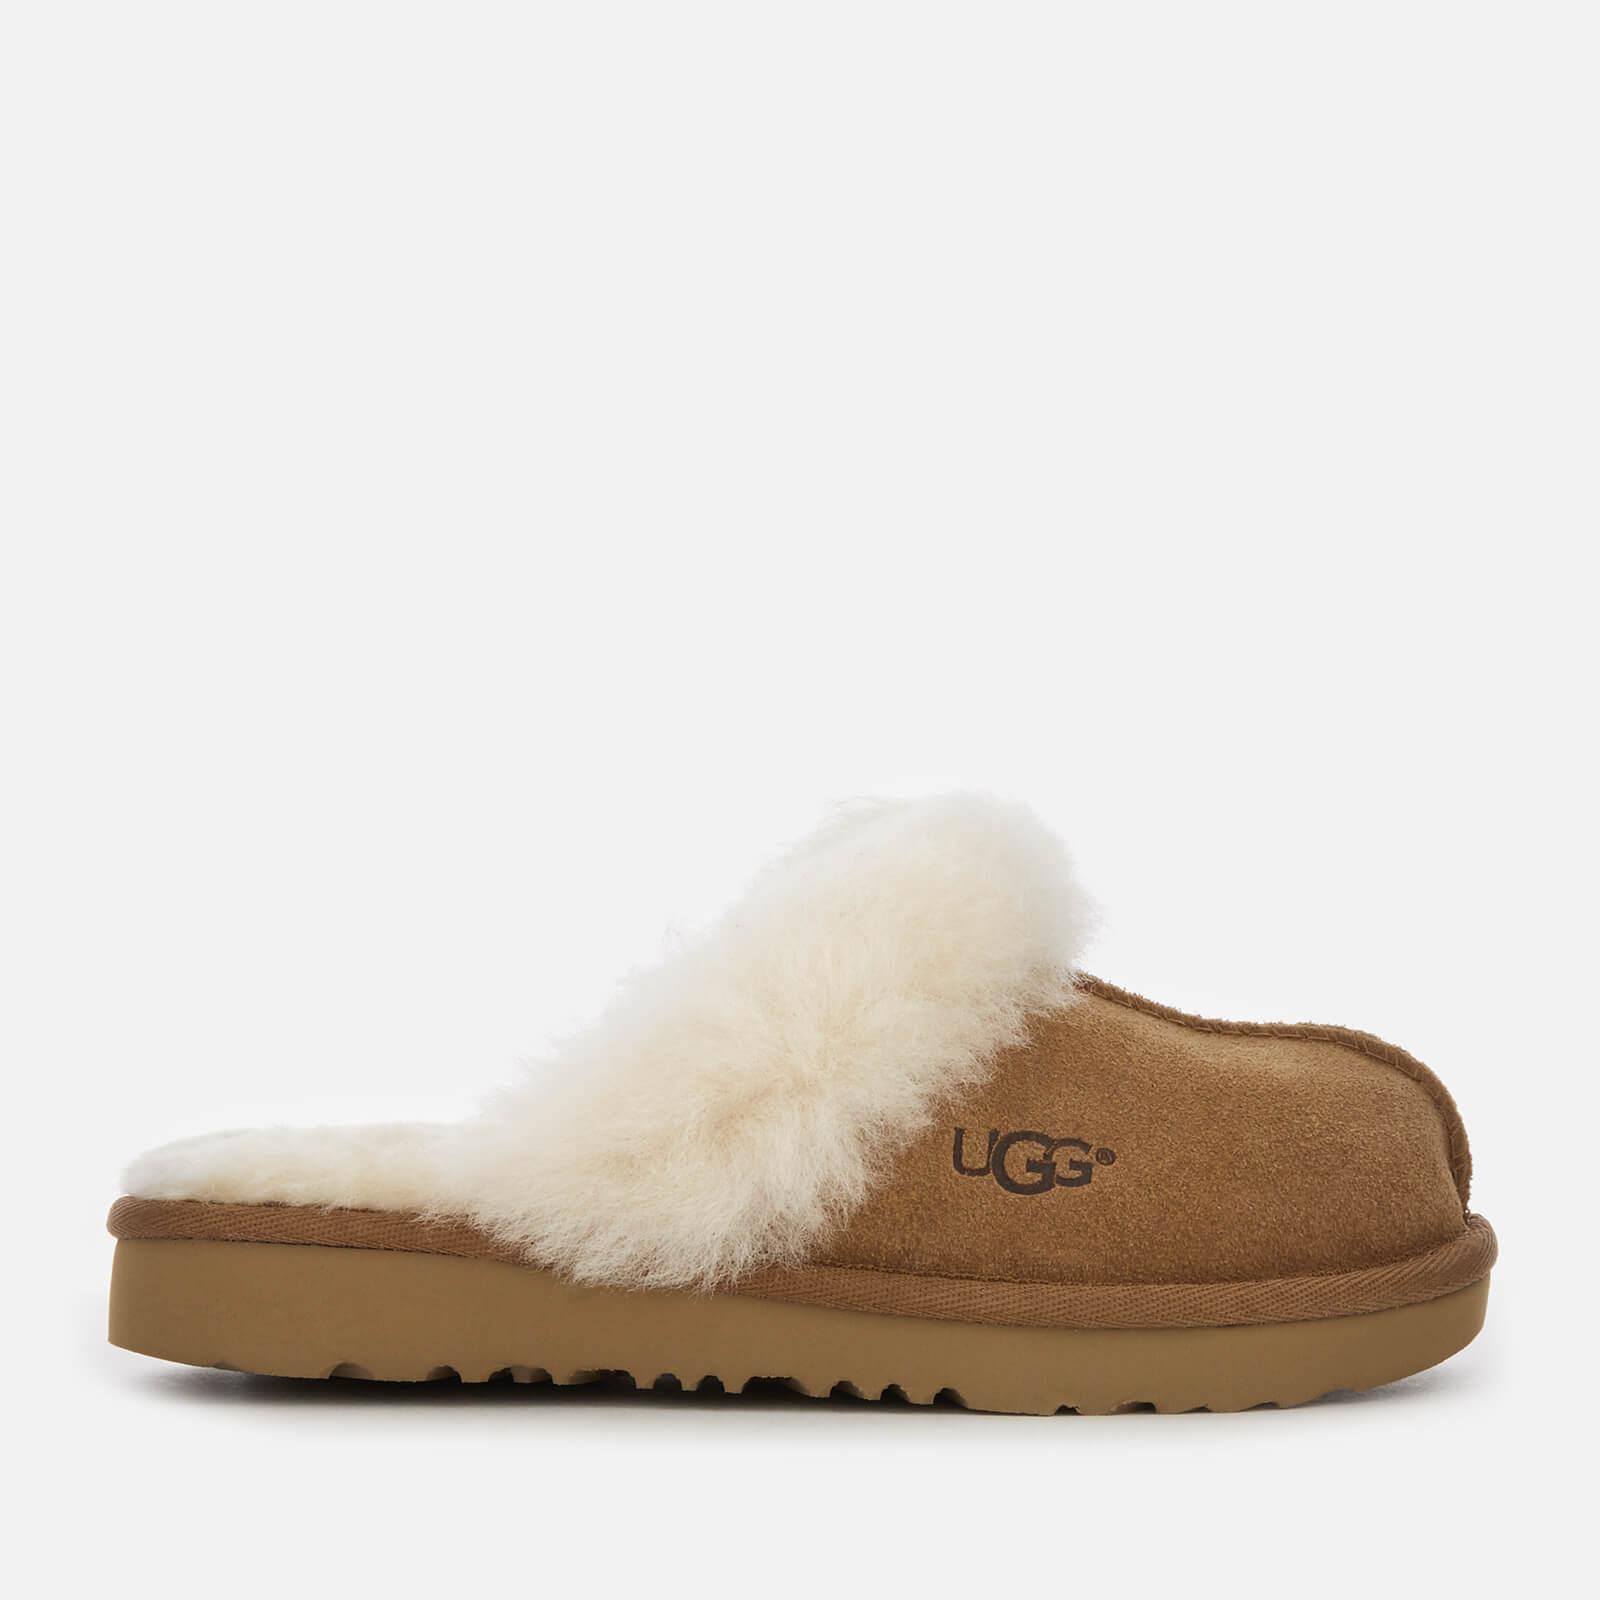 478acee1e52 UGG Kids' Cosy II Slippers - Chestnut